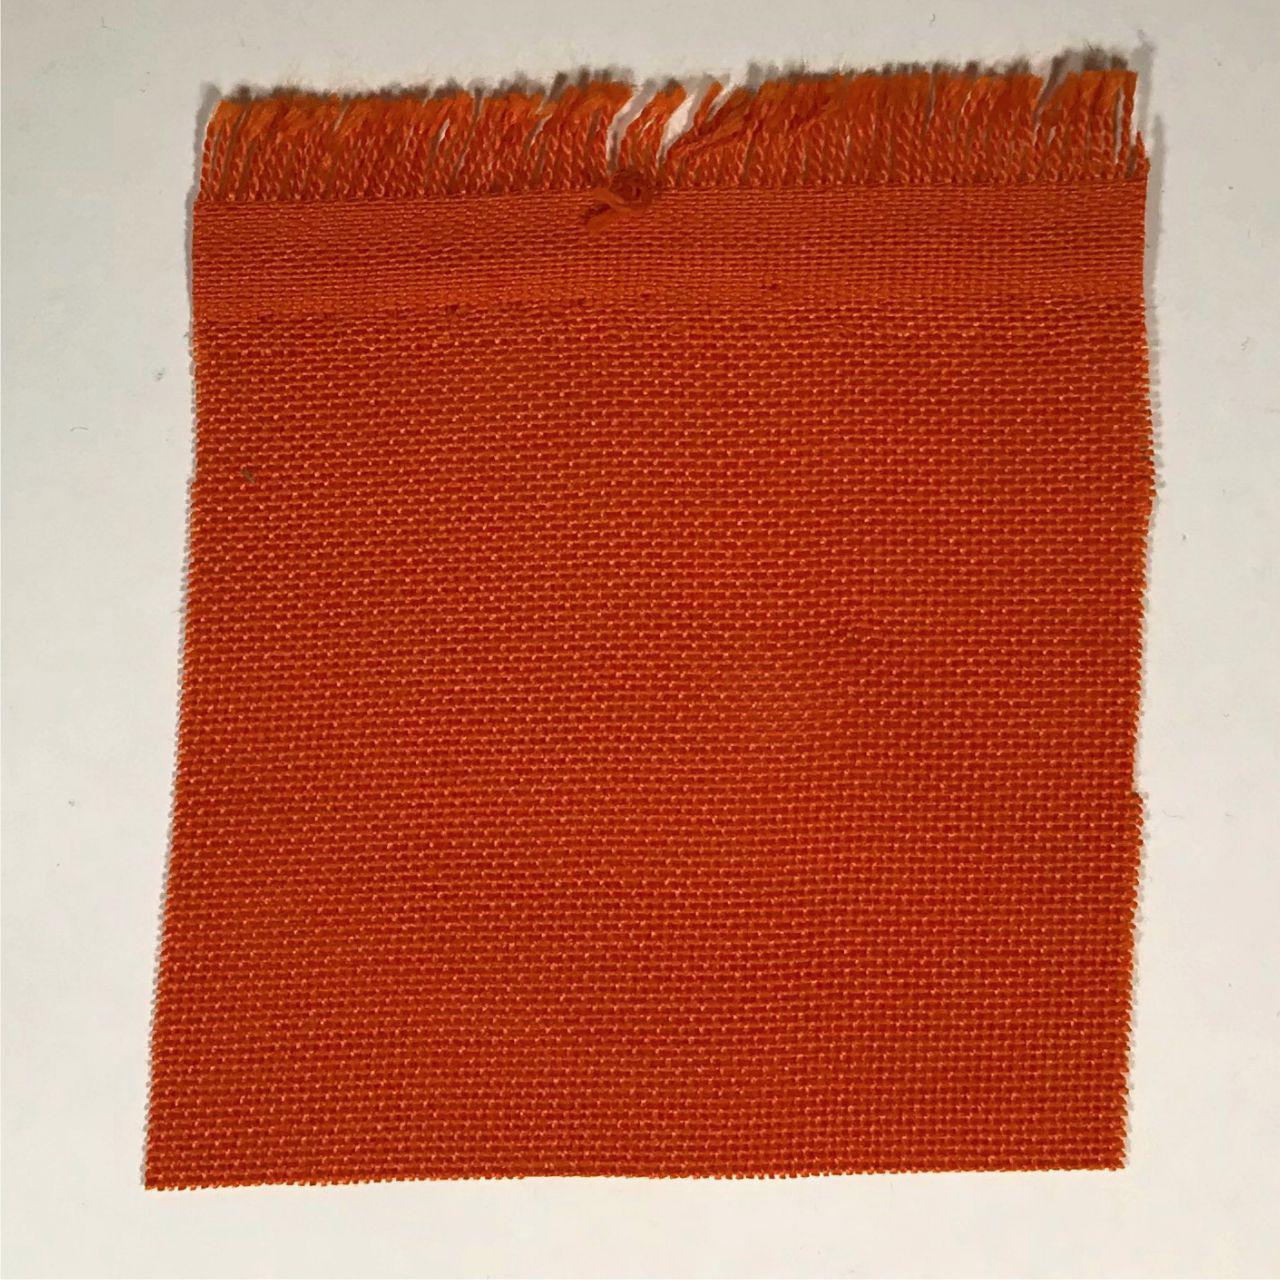 Флажная ткань (оранжевая, 100% полиэстер) - 155 г/м2